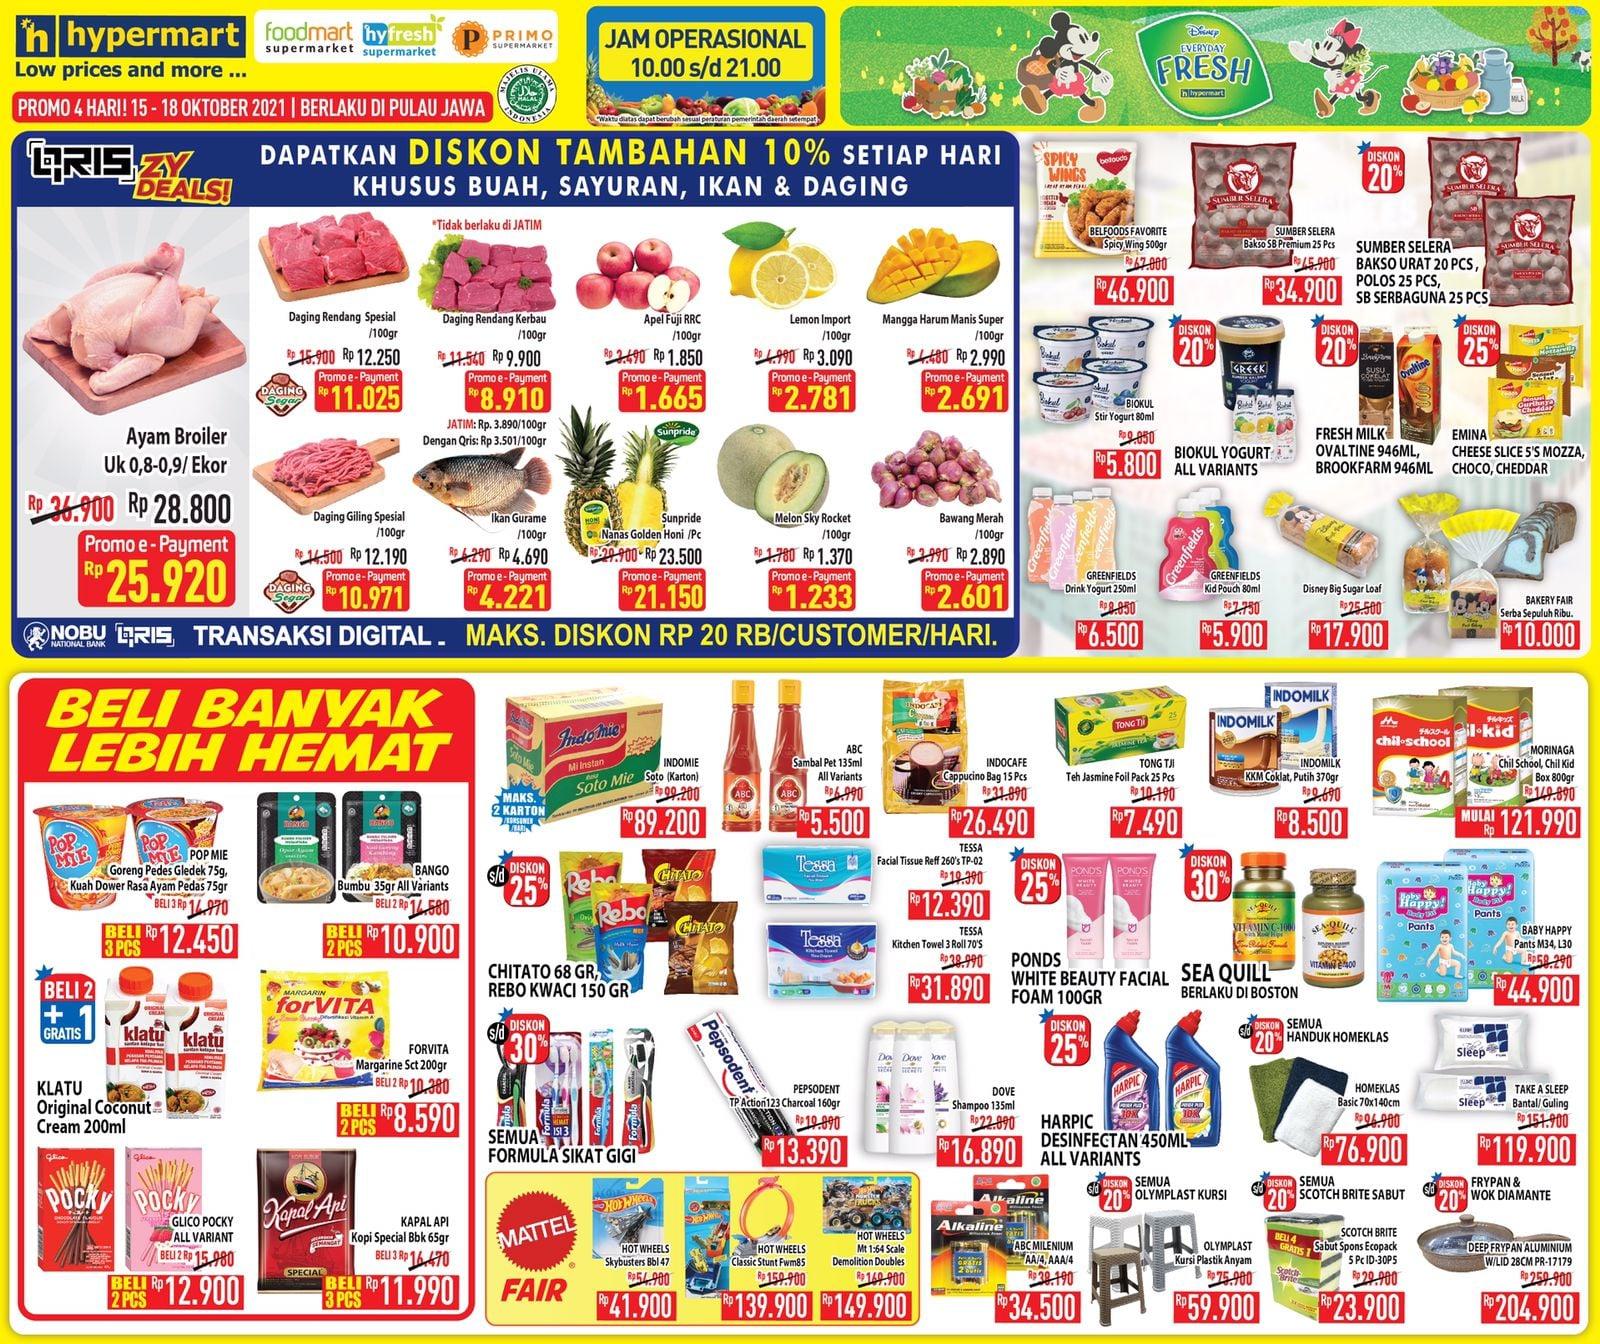 Promo Hypermart JSM Katalog Weekend periode 15-18 Oktober 2021